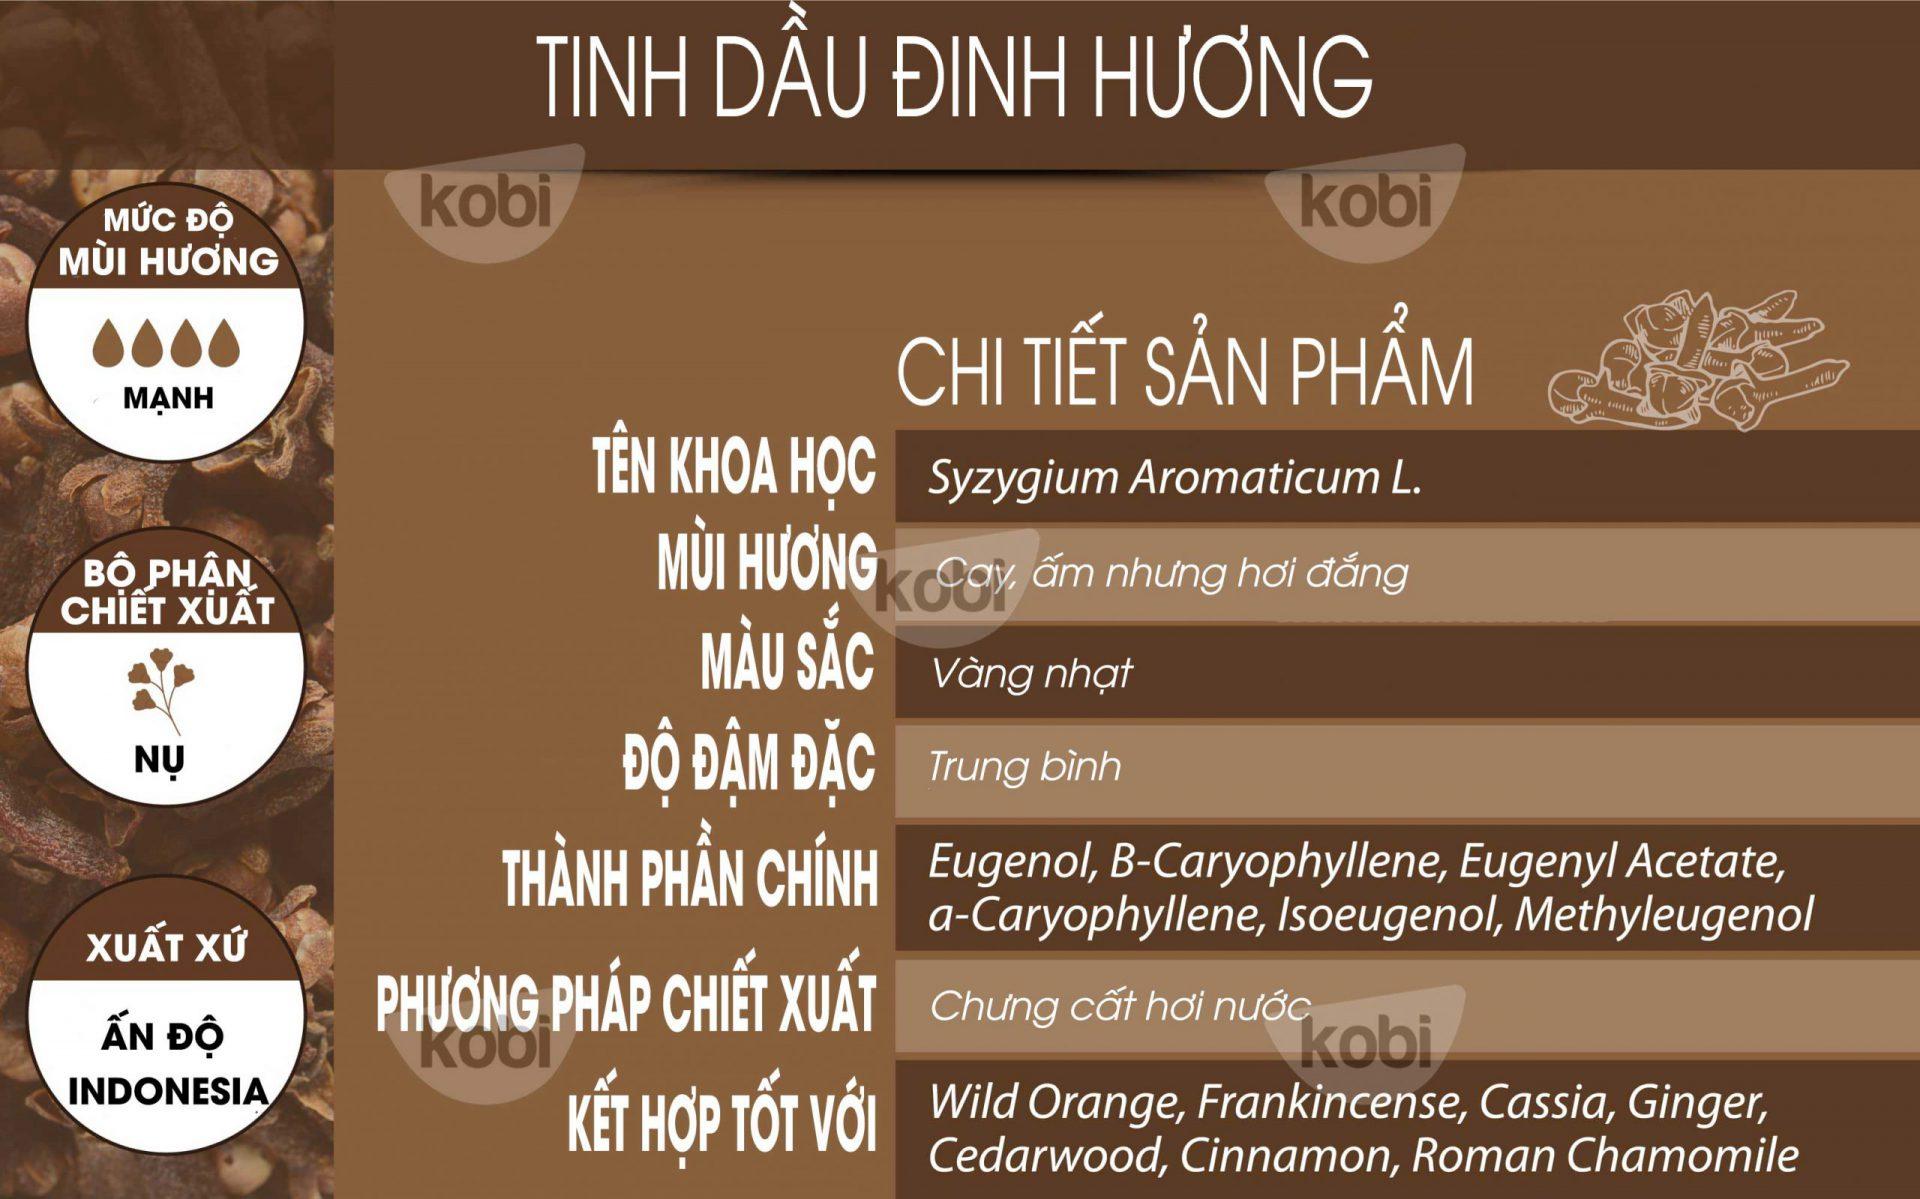 Tinh dầu đinh hương kobi (clove essential oil)